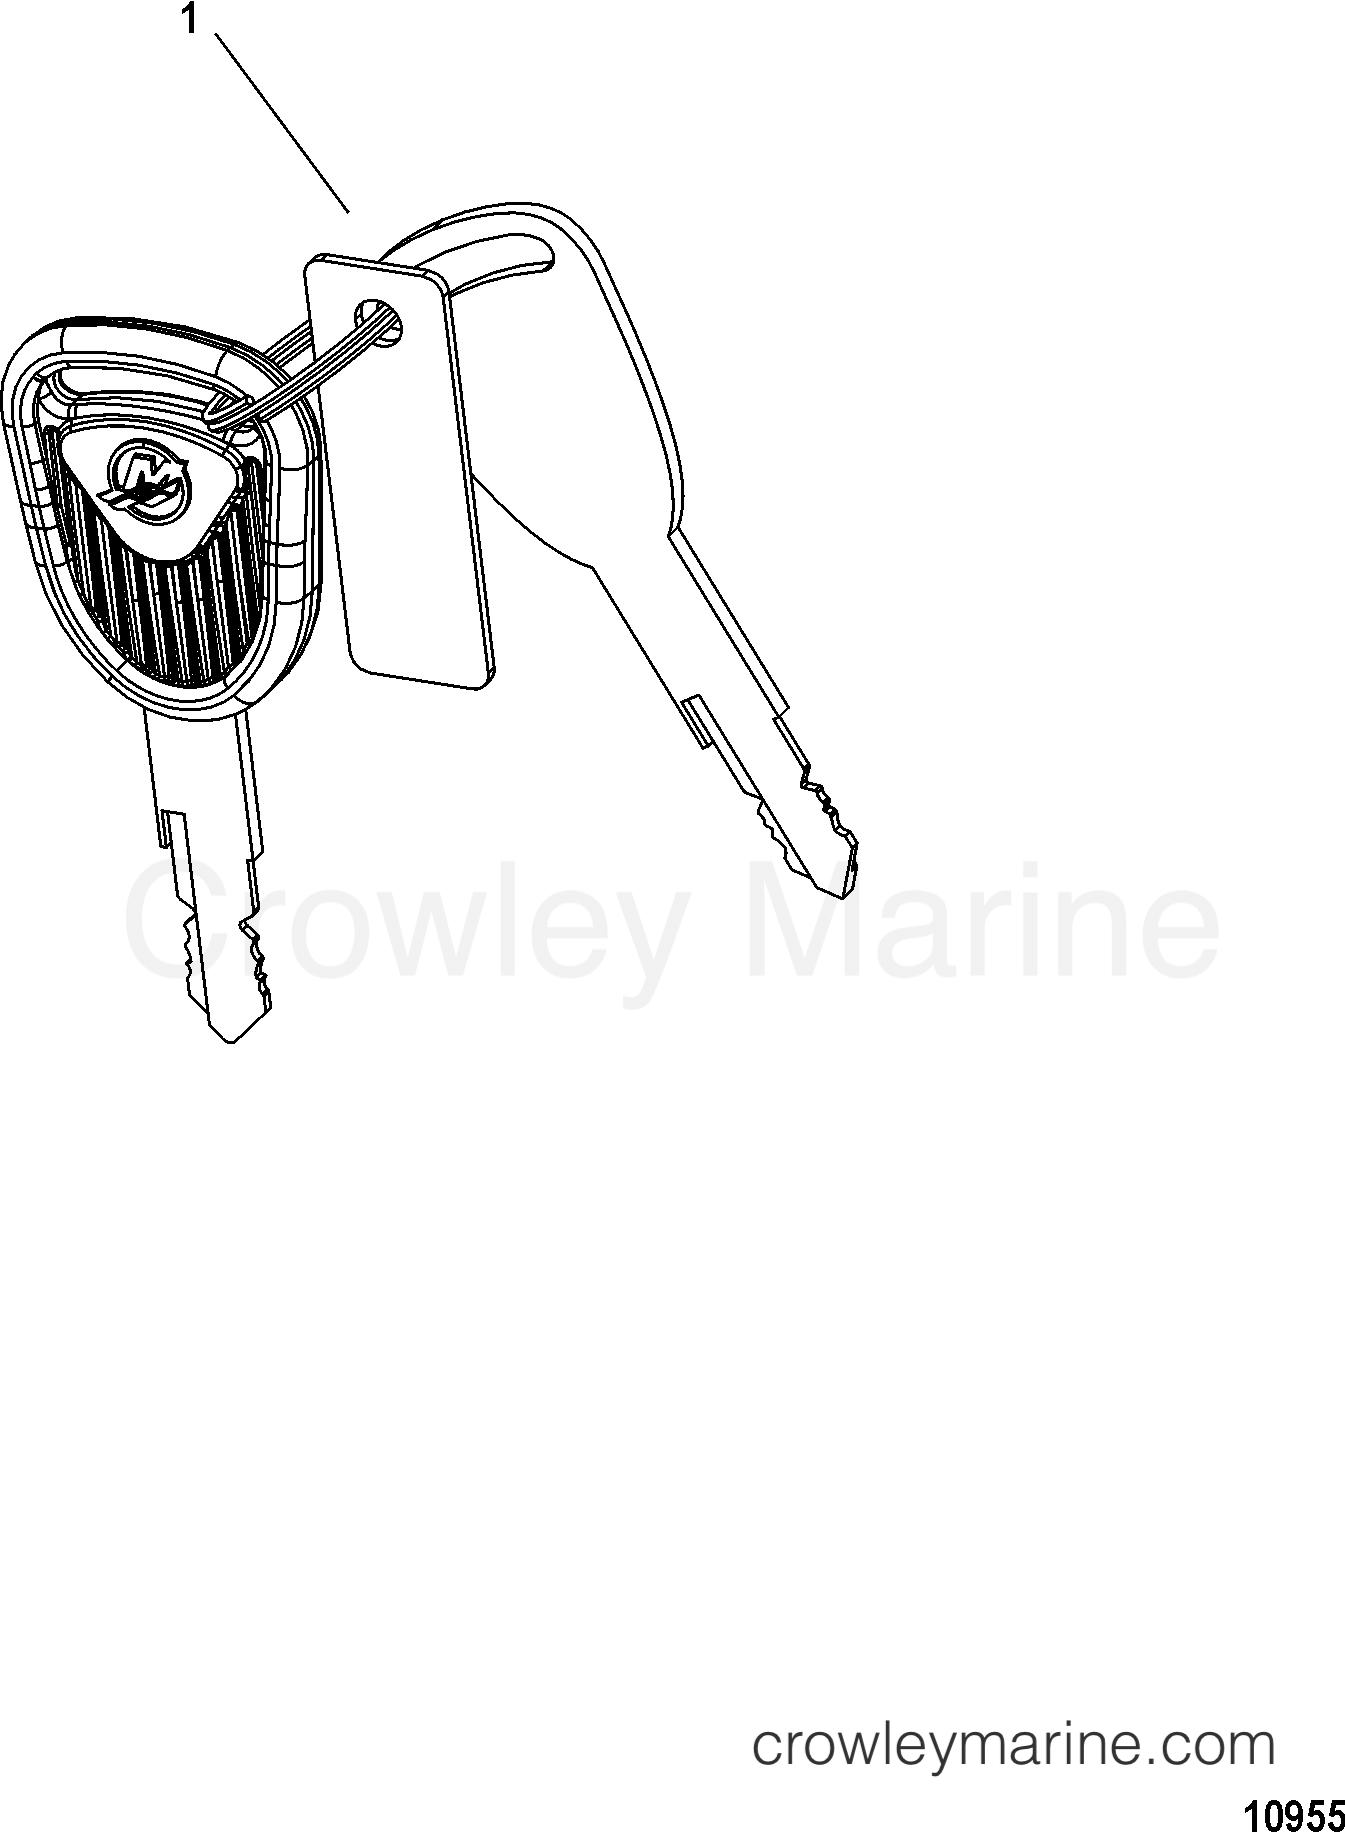 KEY CHART-4 POSITION-WITH MERCURY LOGO(896919 SERIES